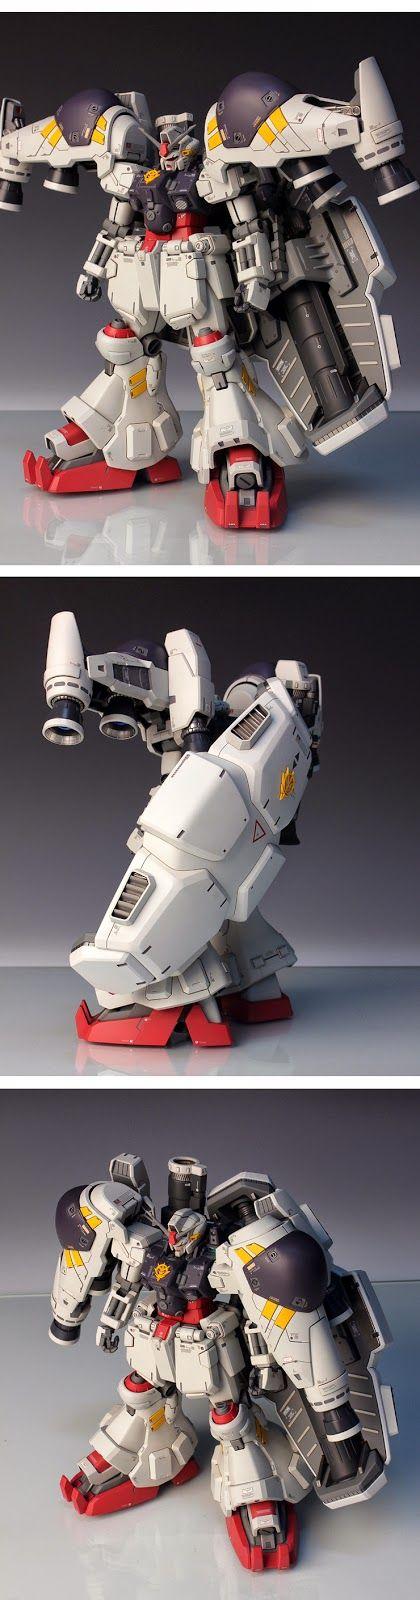 MG 1/100 RX-78GP02A Gundam 'Physalis' - Customized Build